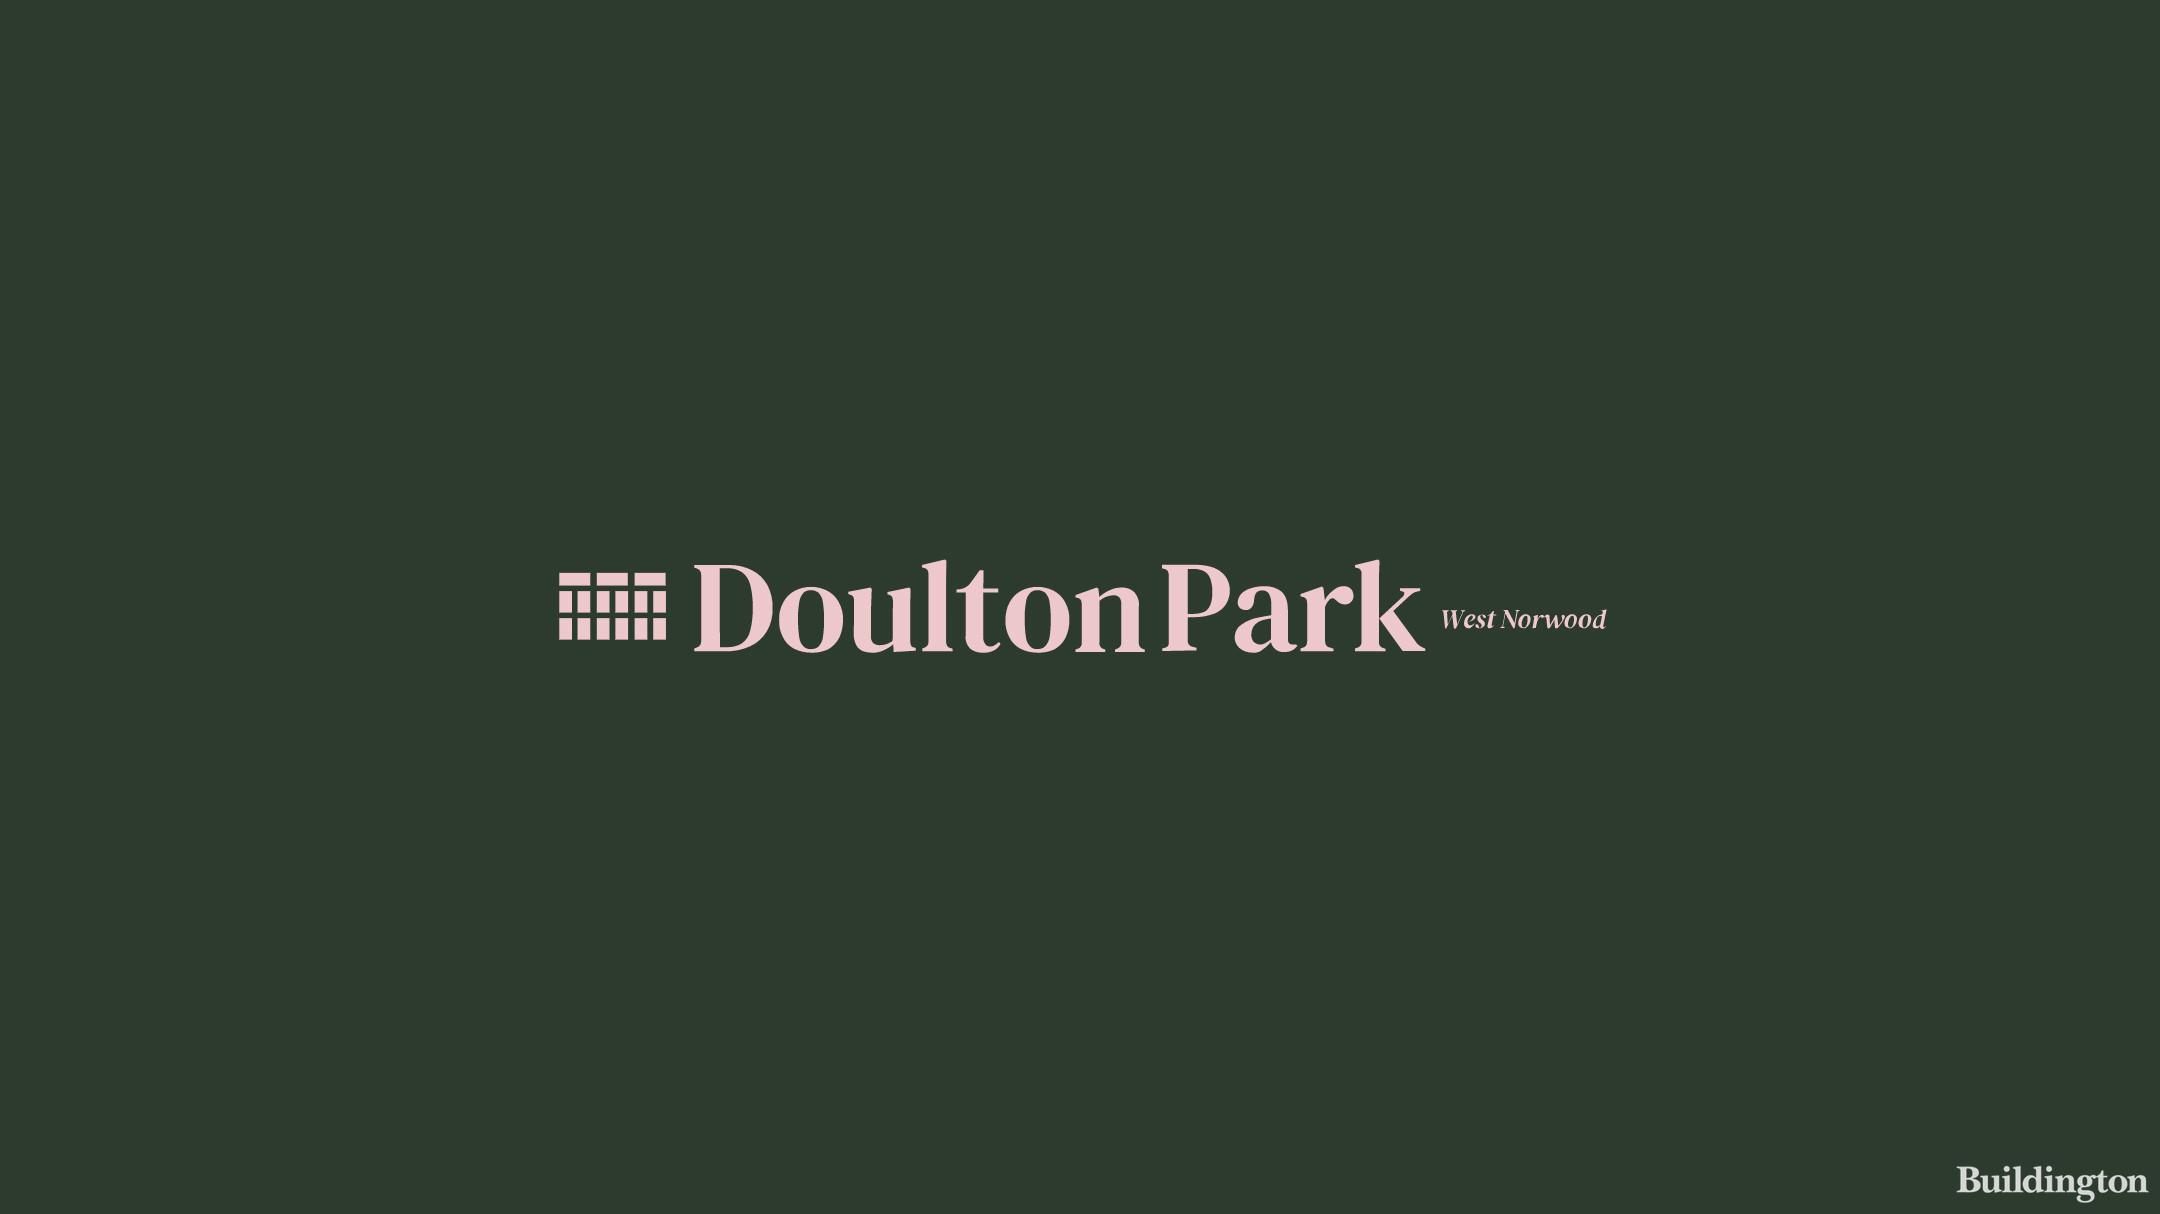 Doulton Park development logo.